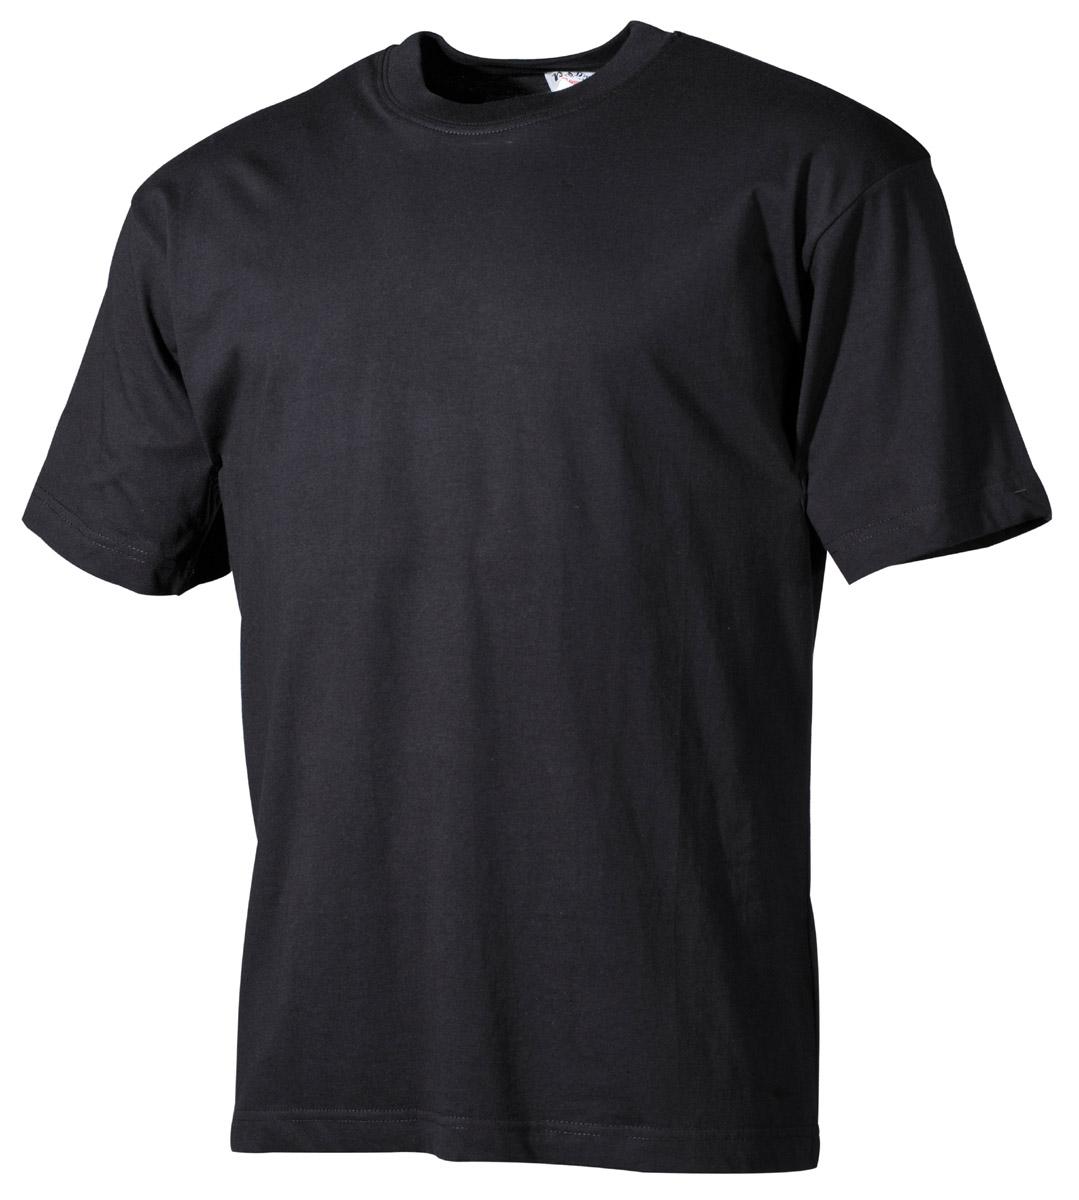 "T-Shirt,  ""Pro Company"", schwarz,  160 g/m²"